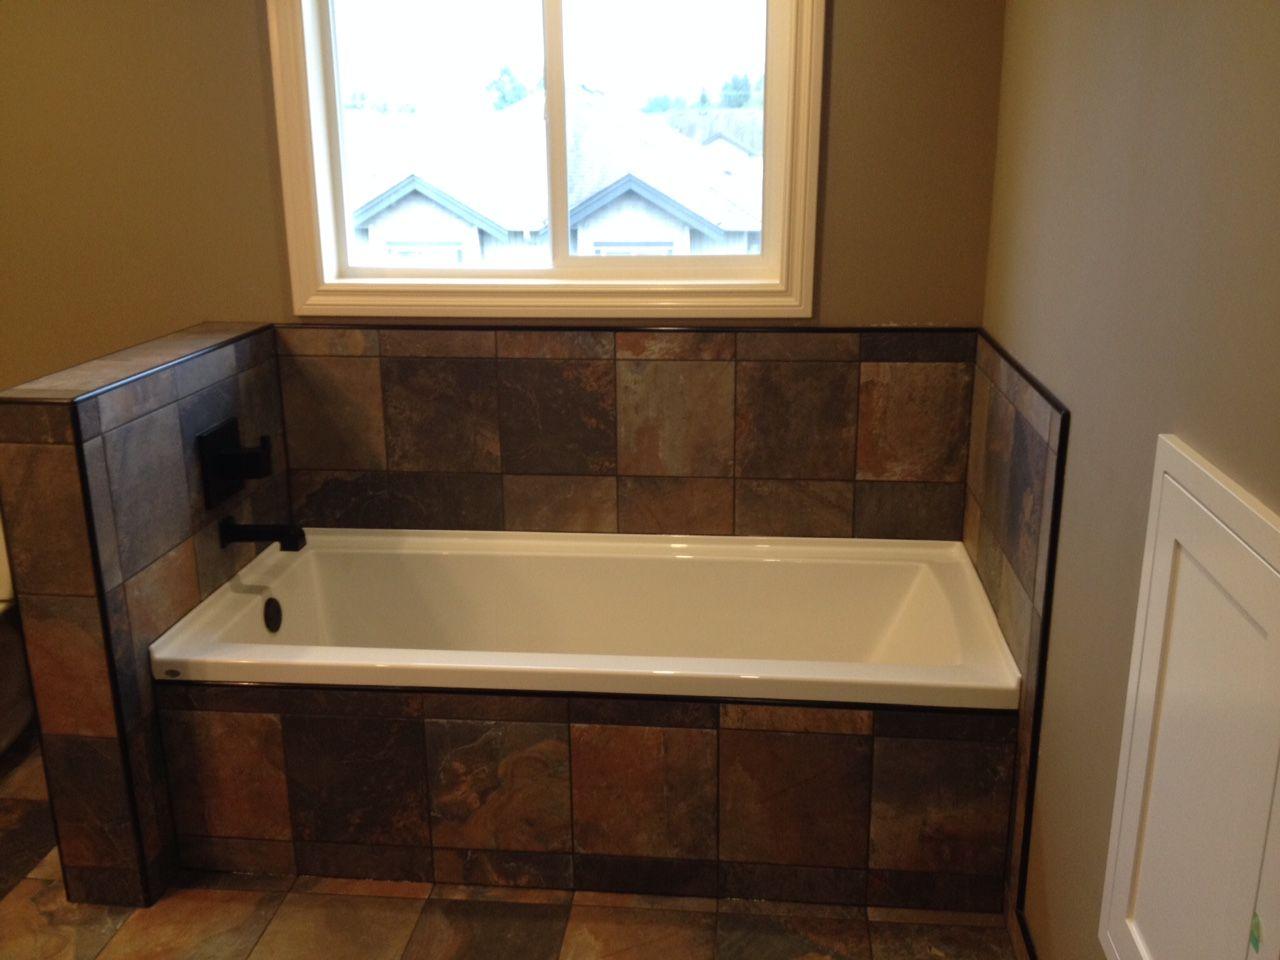 Slate Tile, Black Accessories, Black Tile Trim, Bathtub